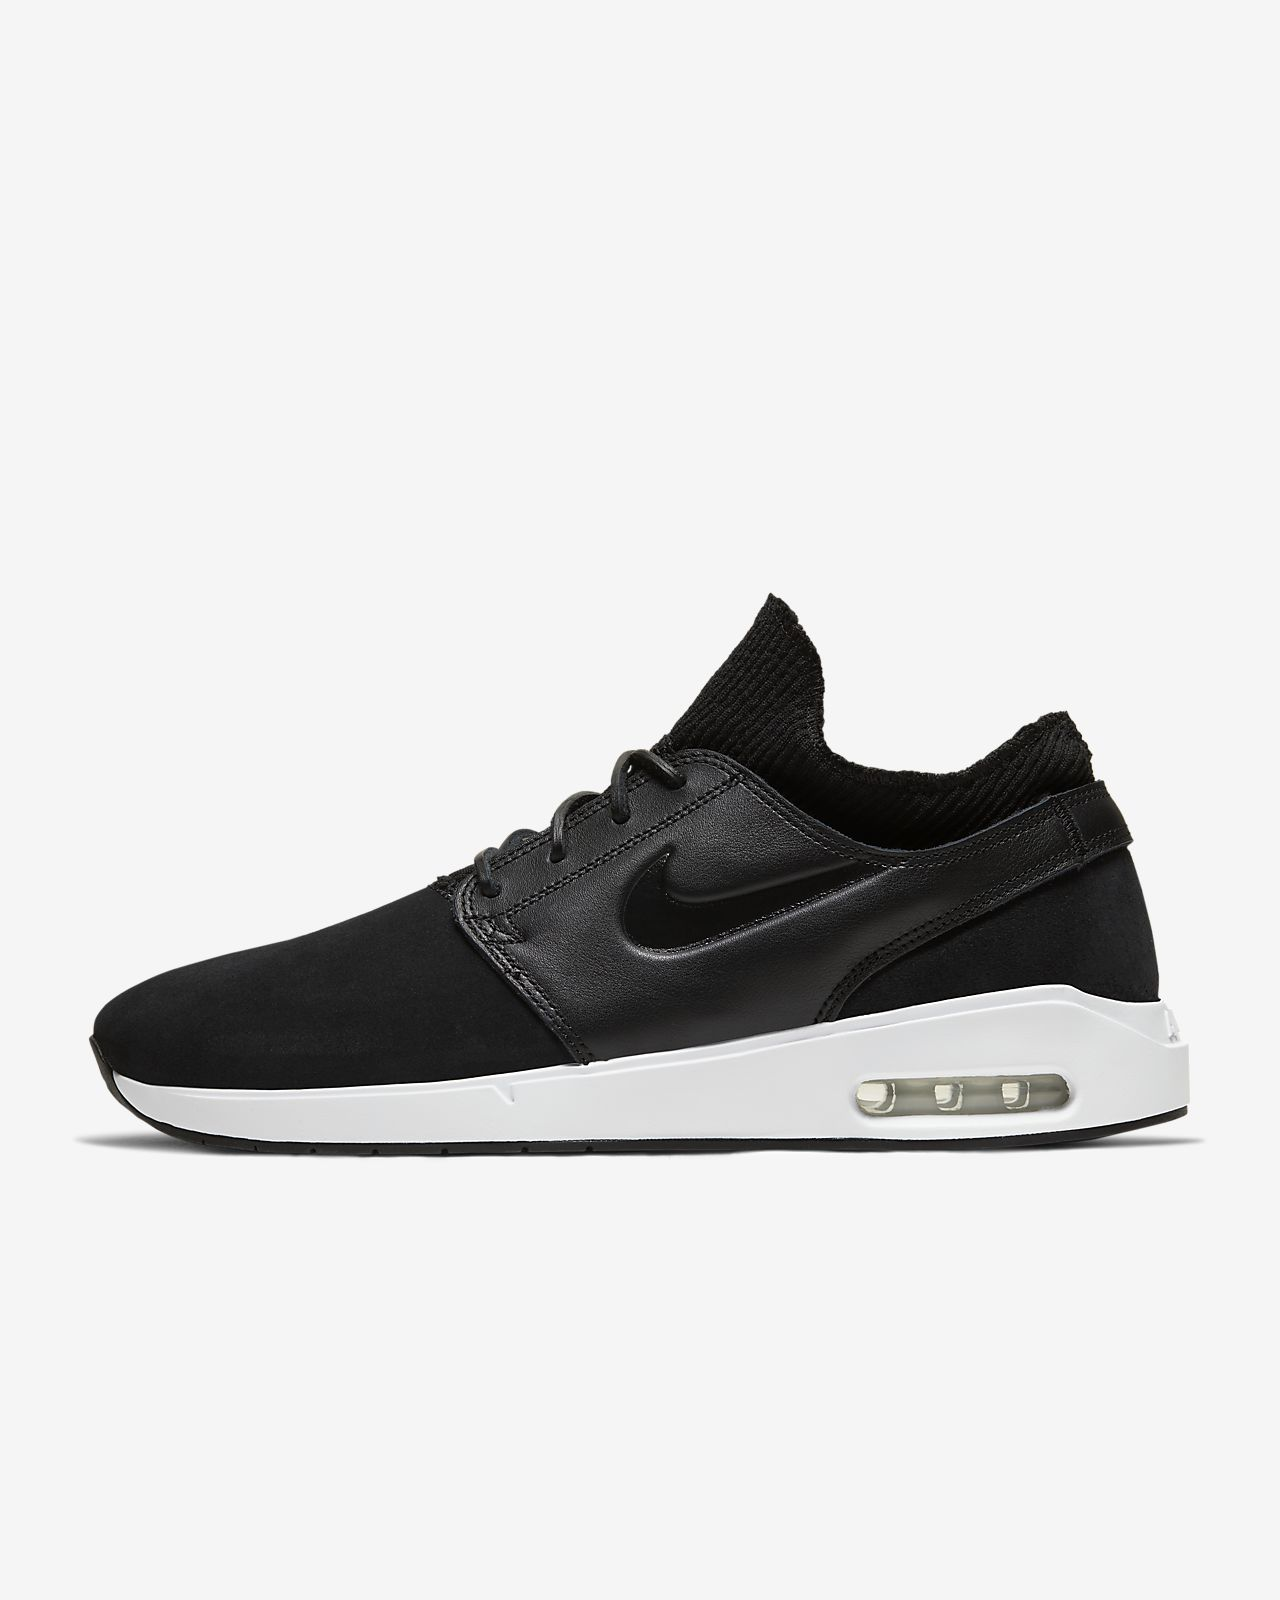 Nike SB Air Max Stefan Janoski 2 Premium Sabatilles de skateboard